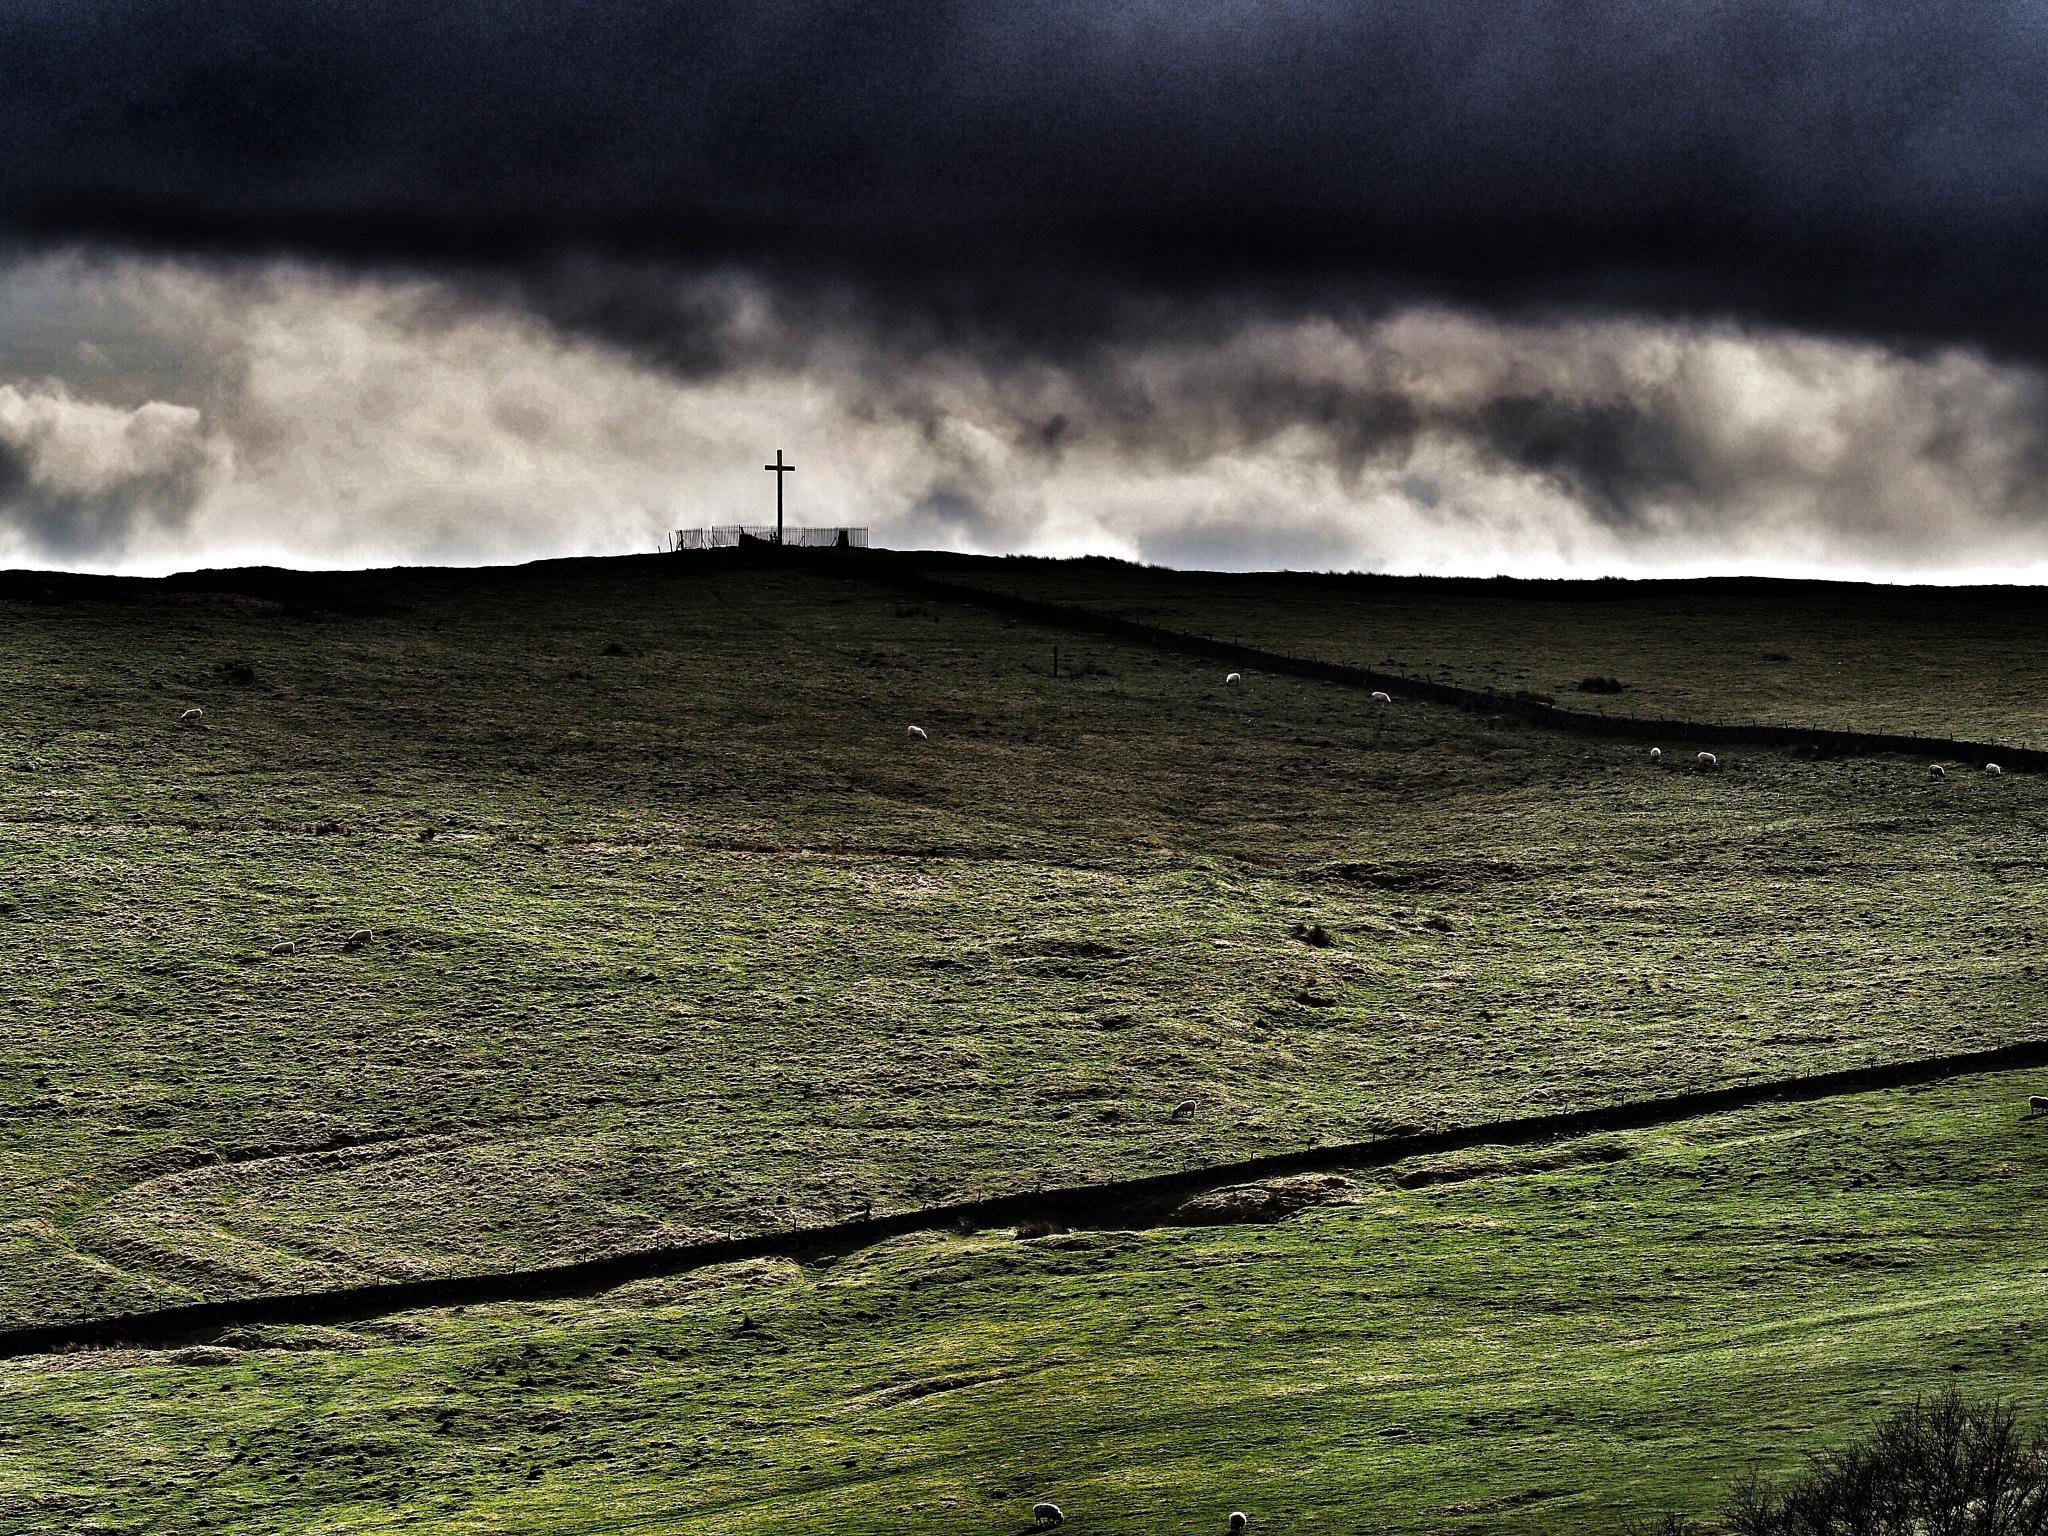 Corbar Cross, Buxton. by john.bradburn